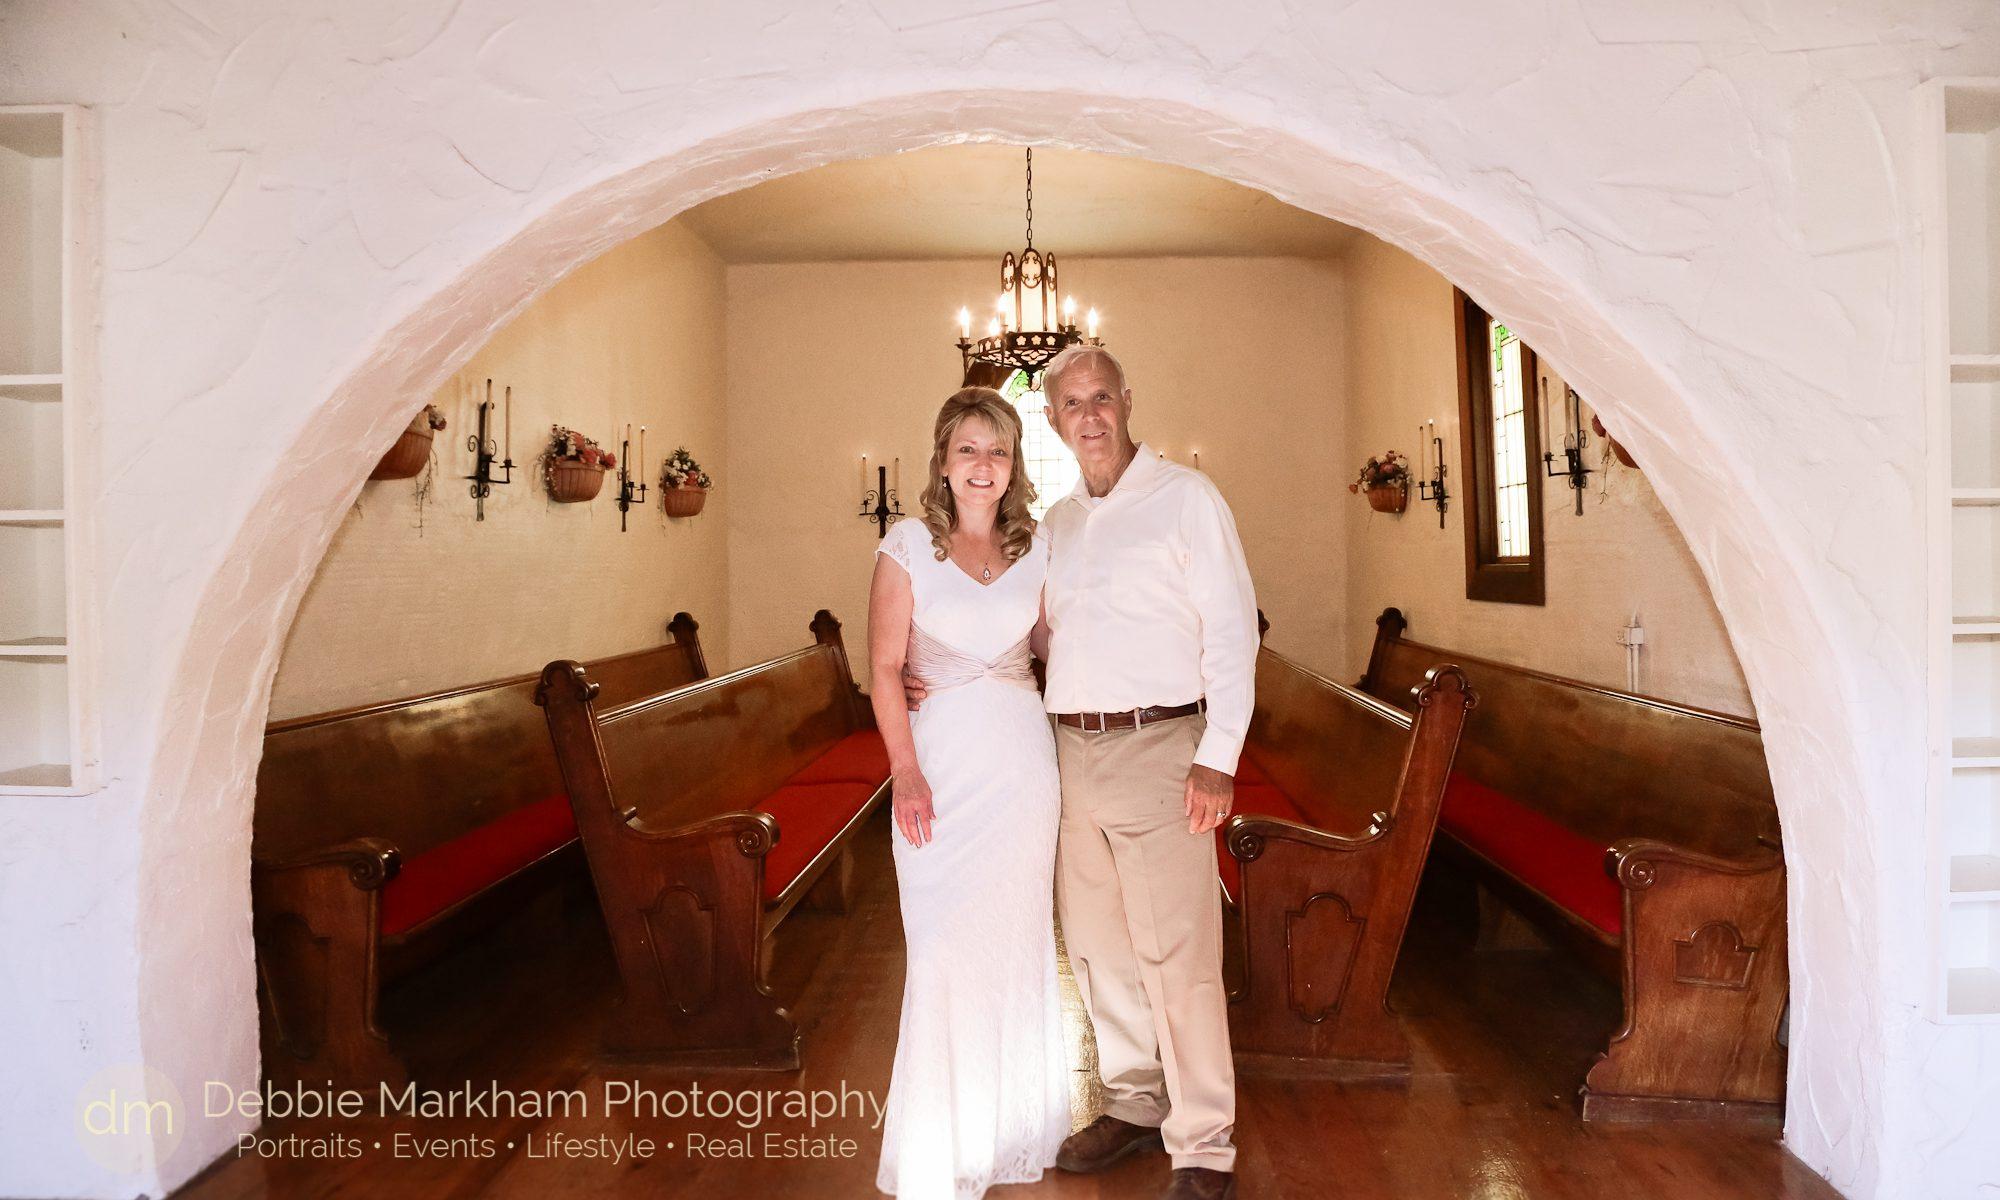 Debbie Markham Photo+Harmony Wedding+Small Town+ Intimate Chapel Wedding